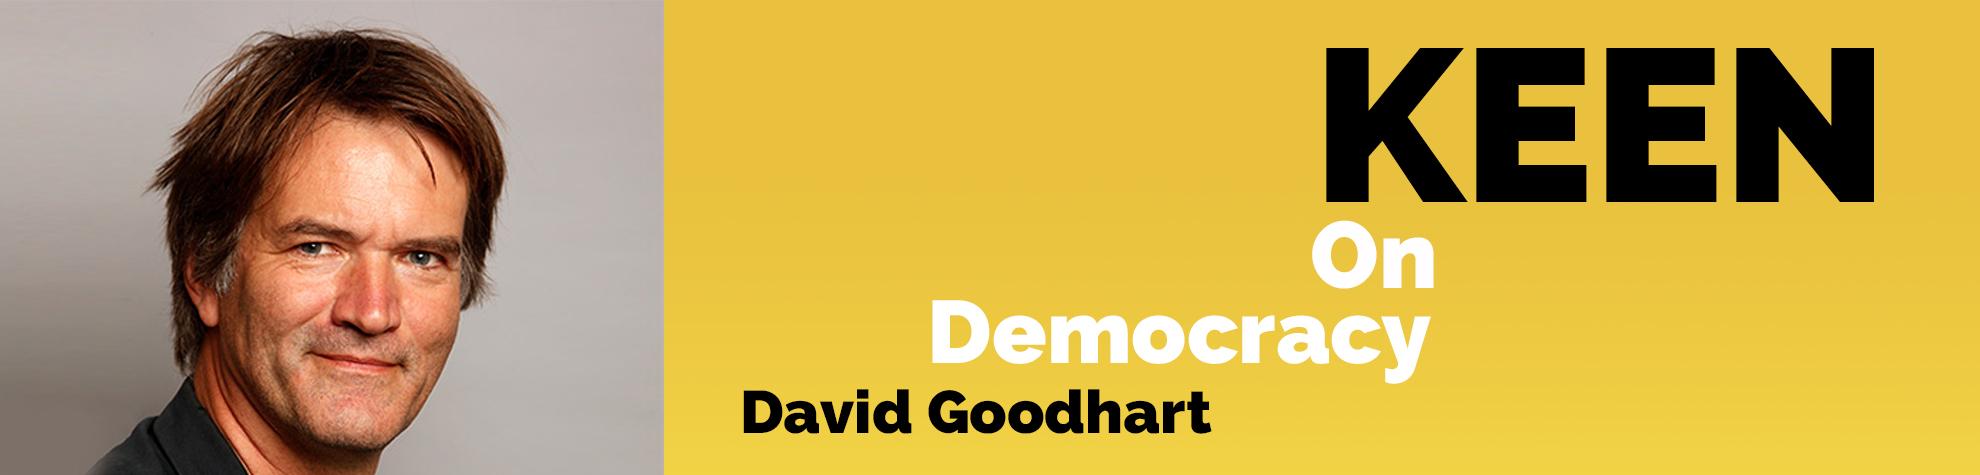 david goodhart.jpg